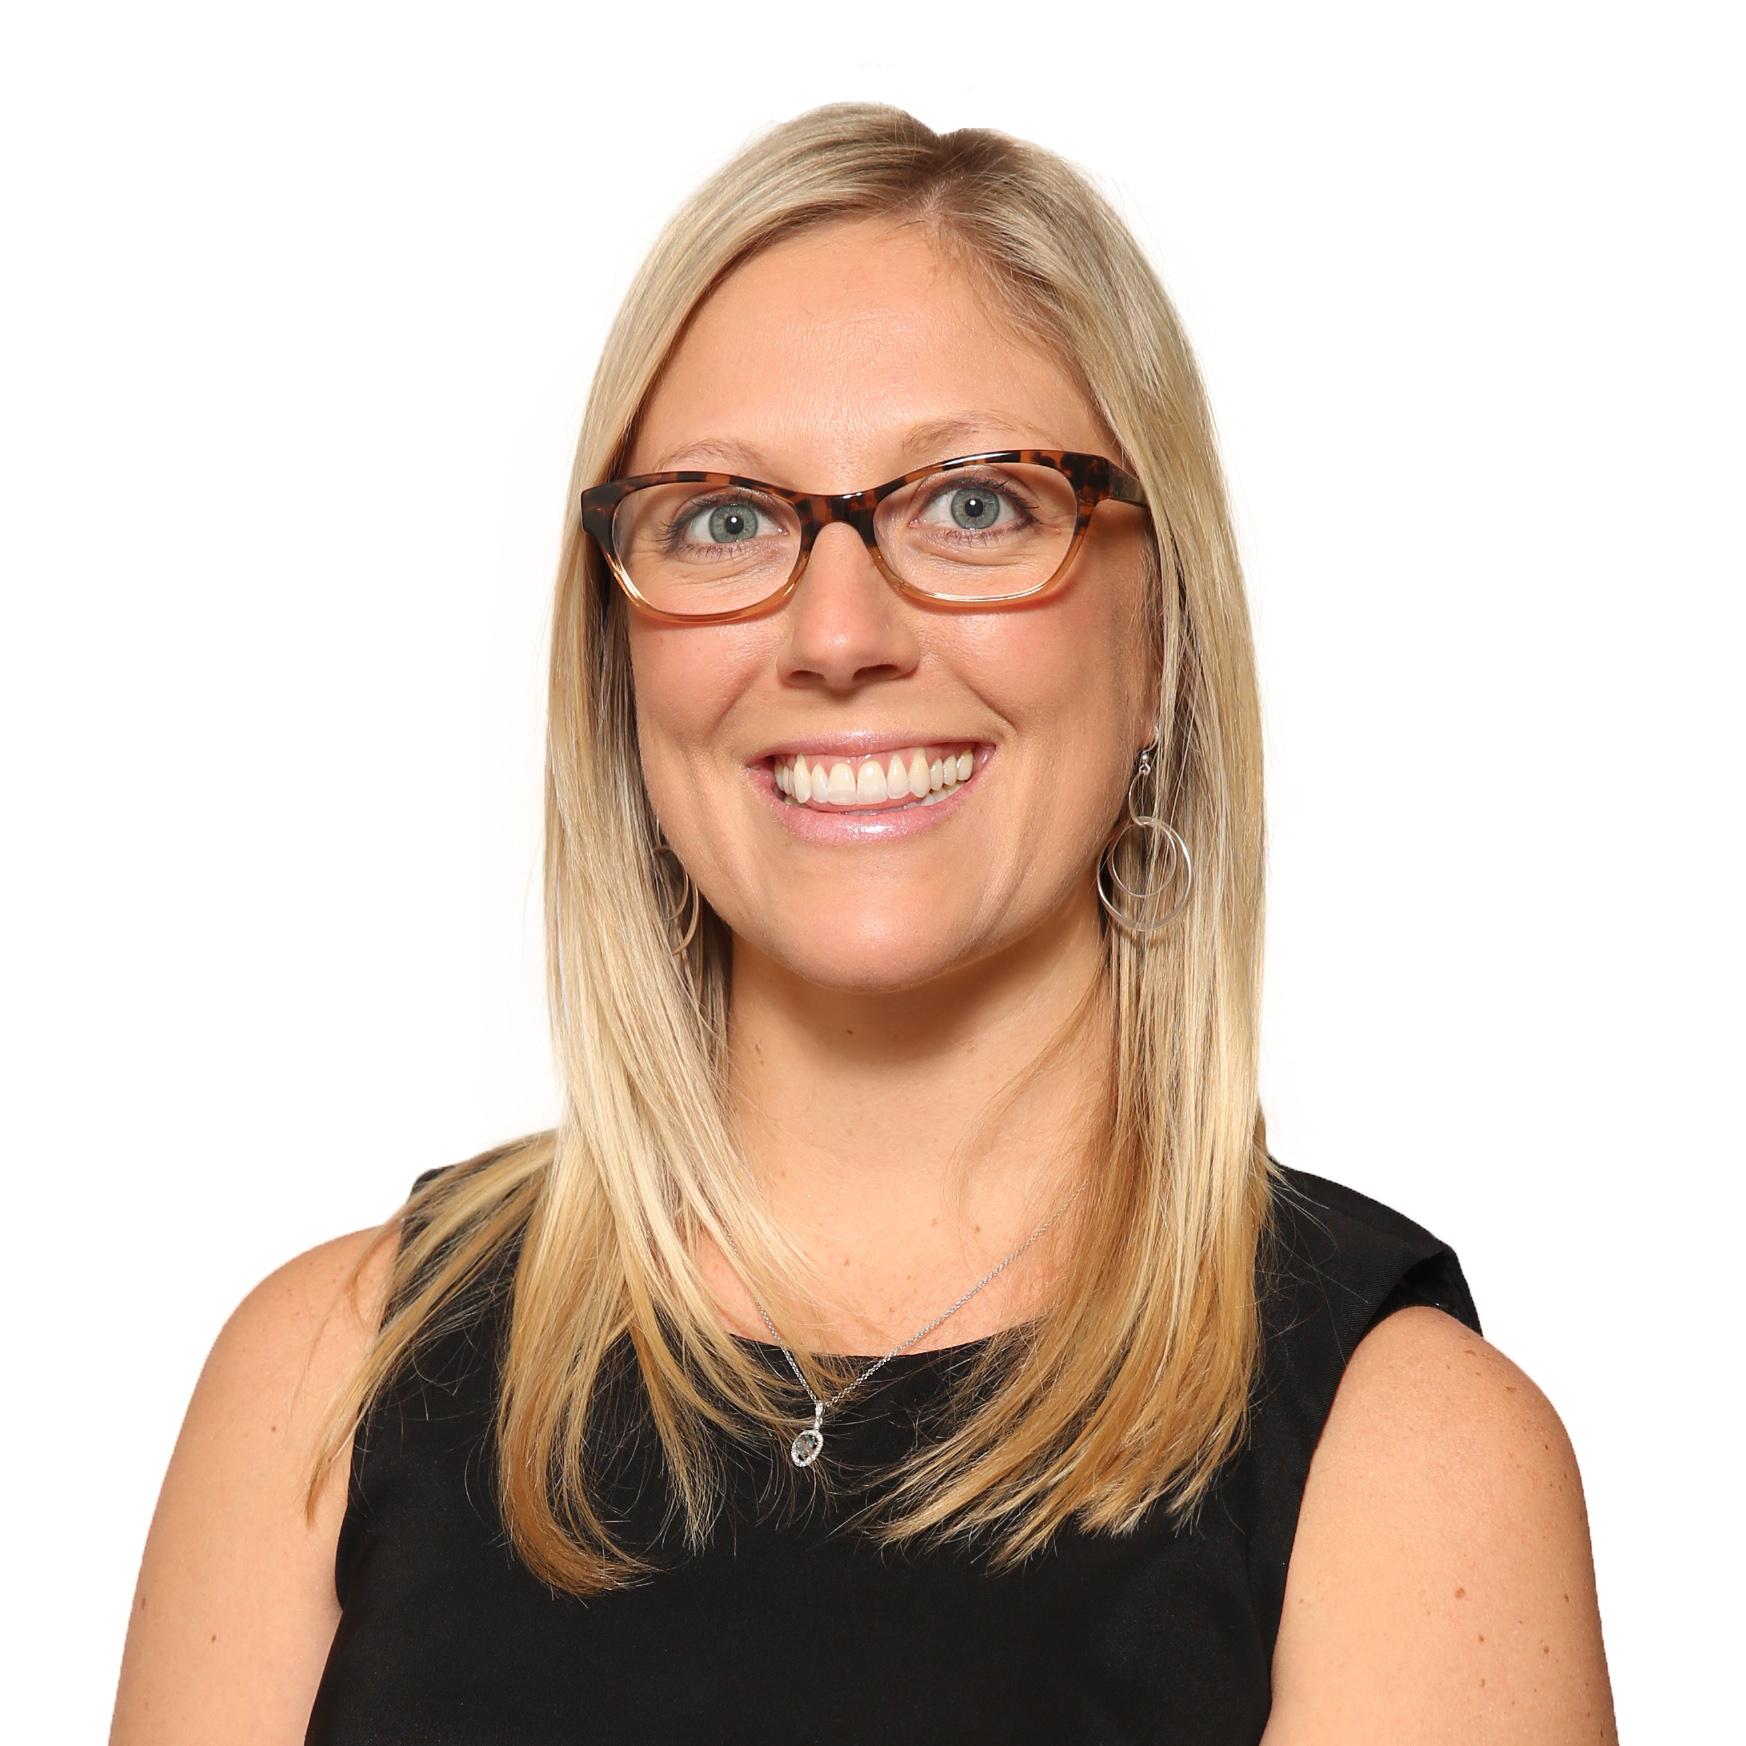 Eva MacCleery is the Director of Care.com HomePay